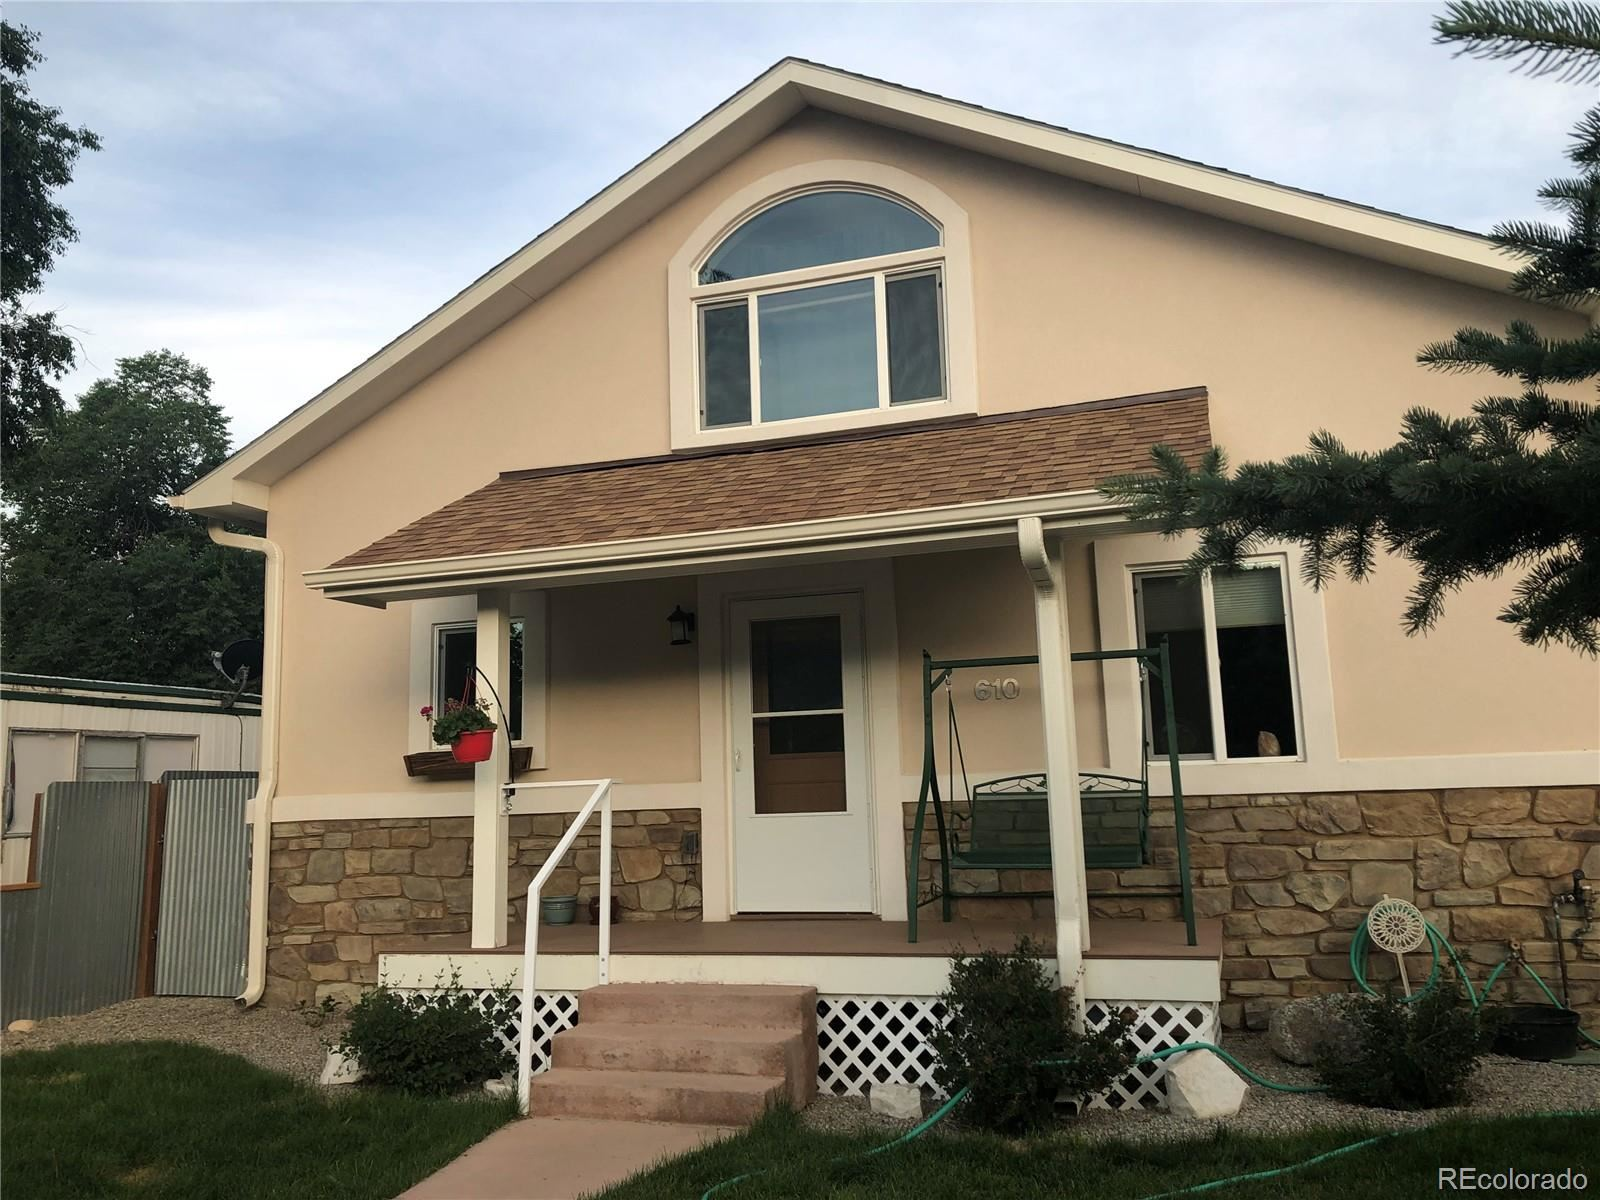 610 Vine Street, Salida, CO 81201 - #: 4136072